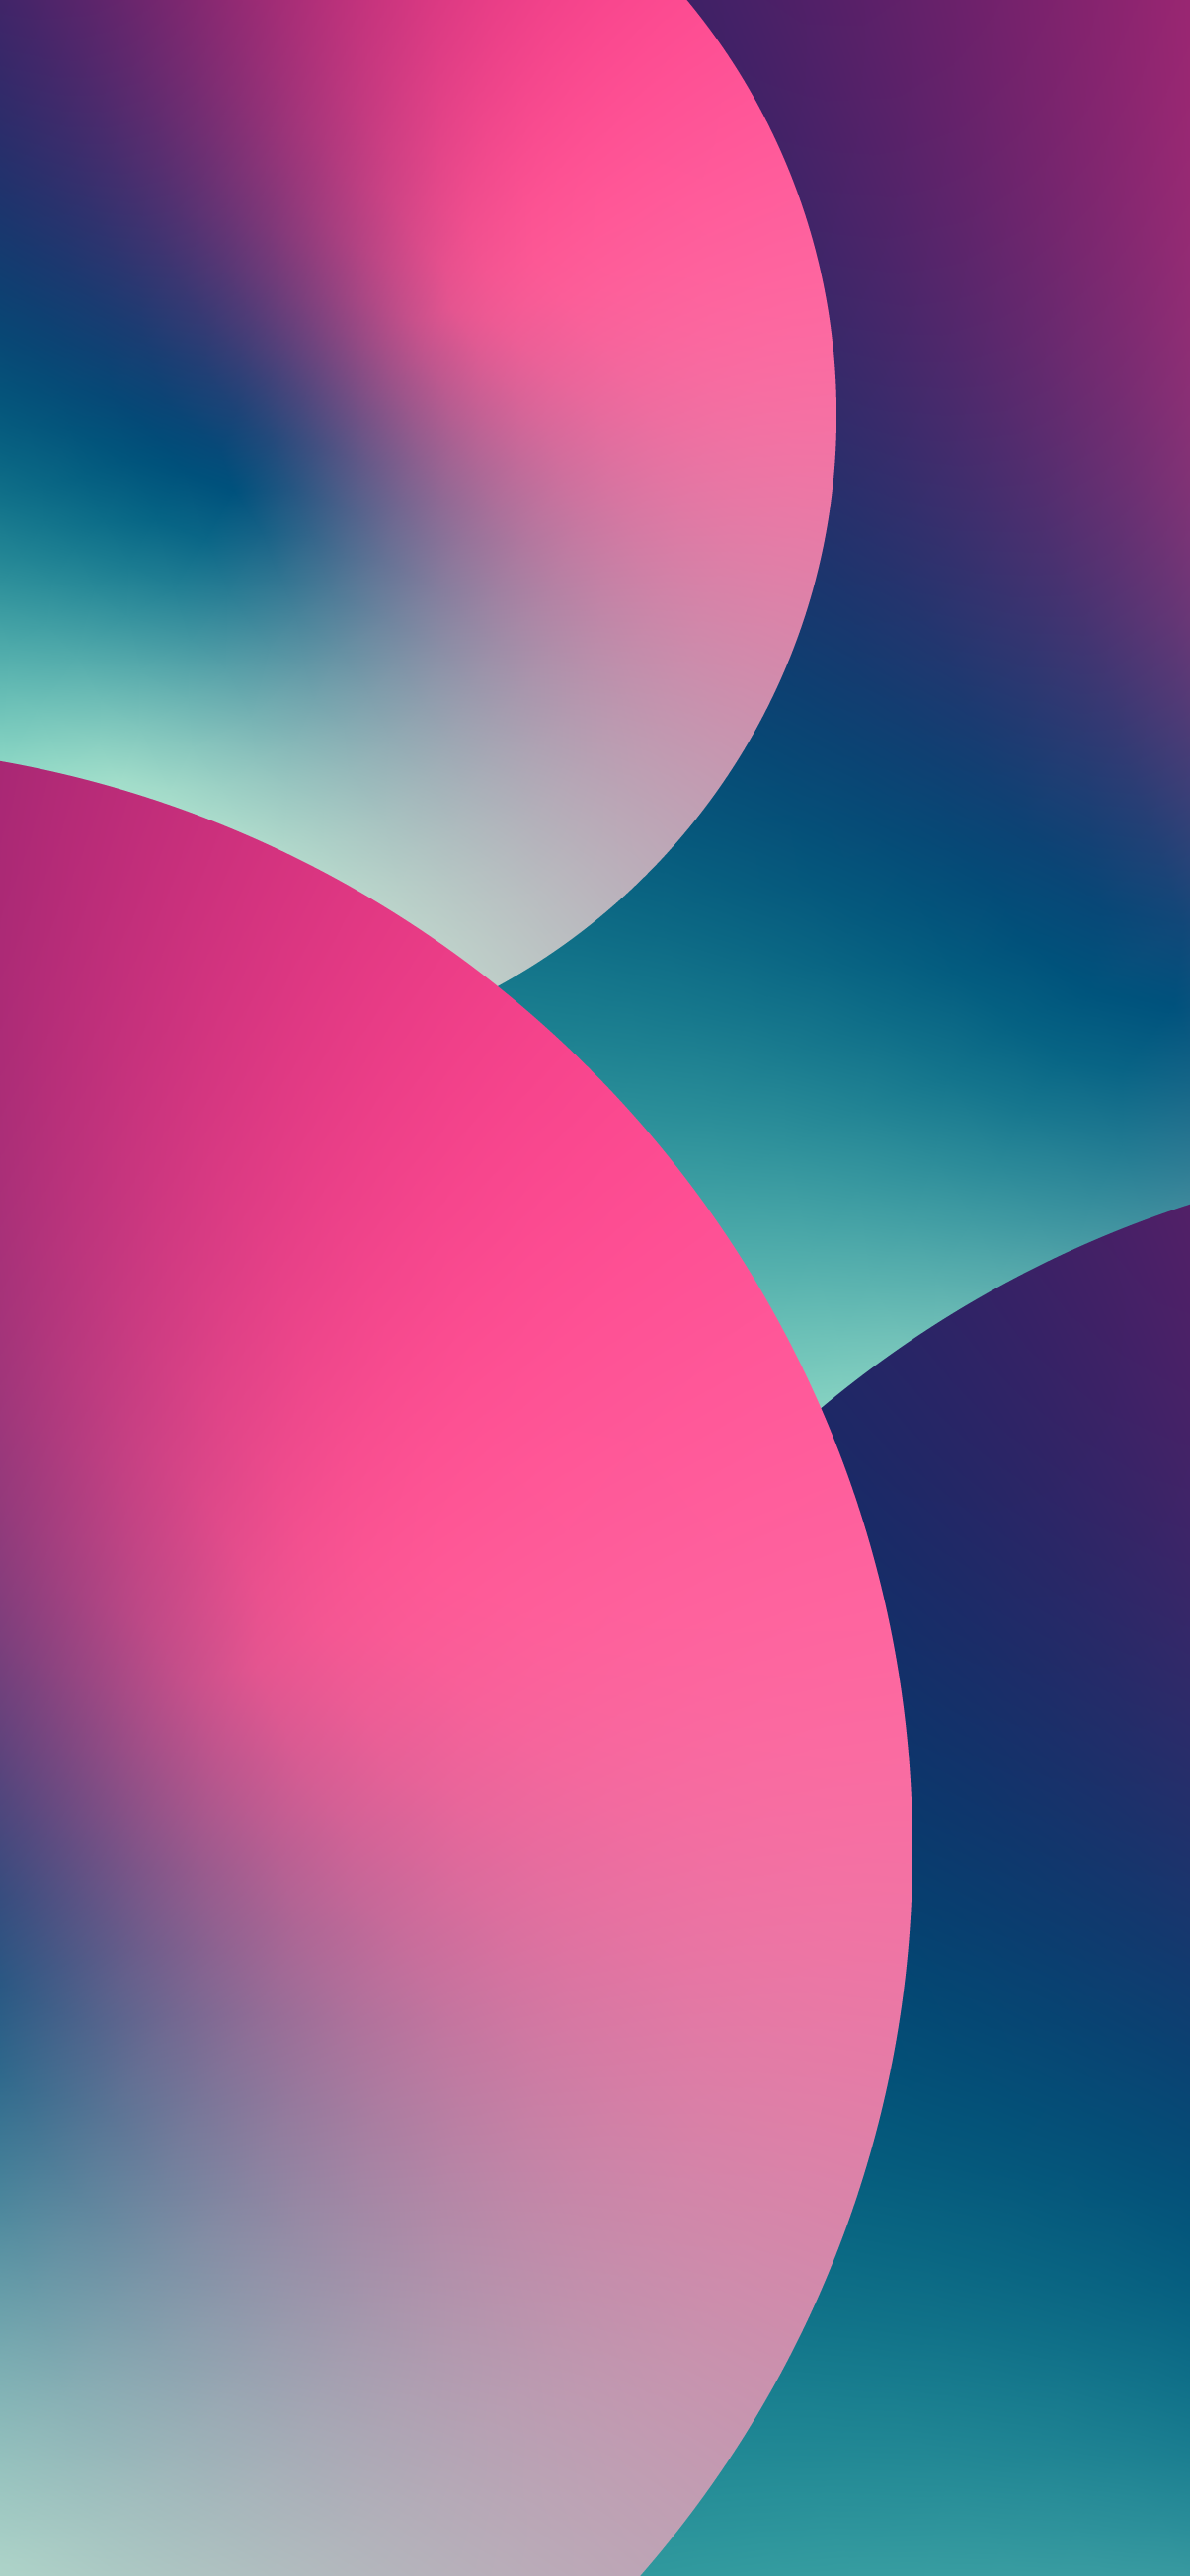 aesthetic-iphone-wallpaper